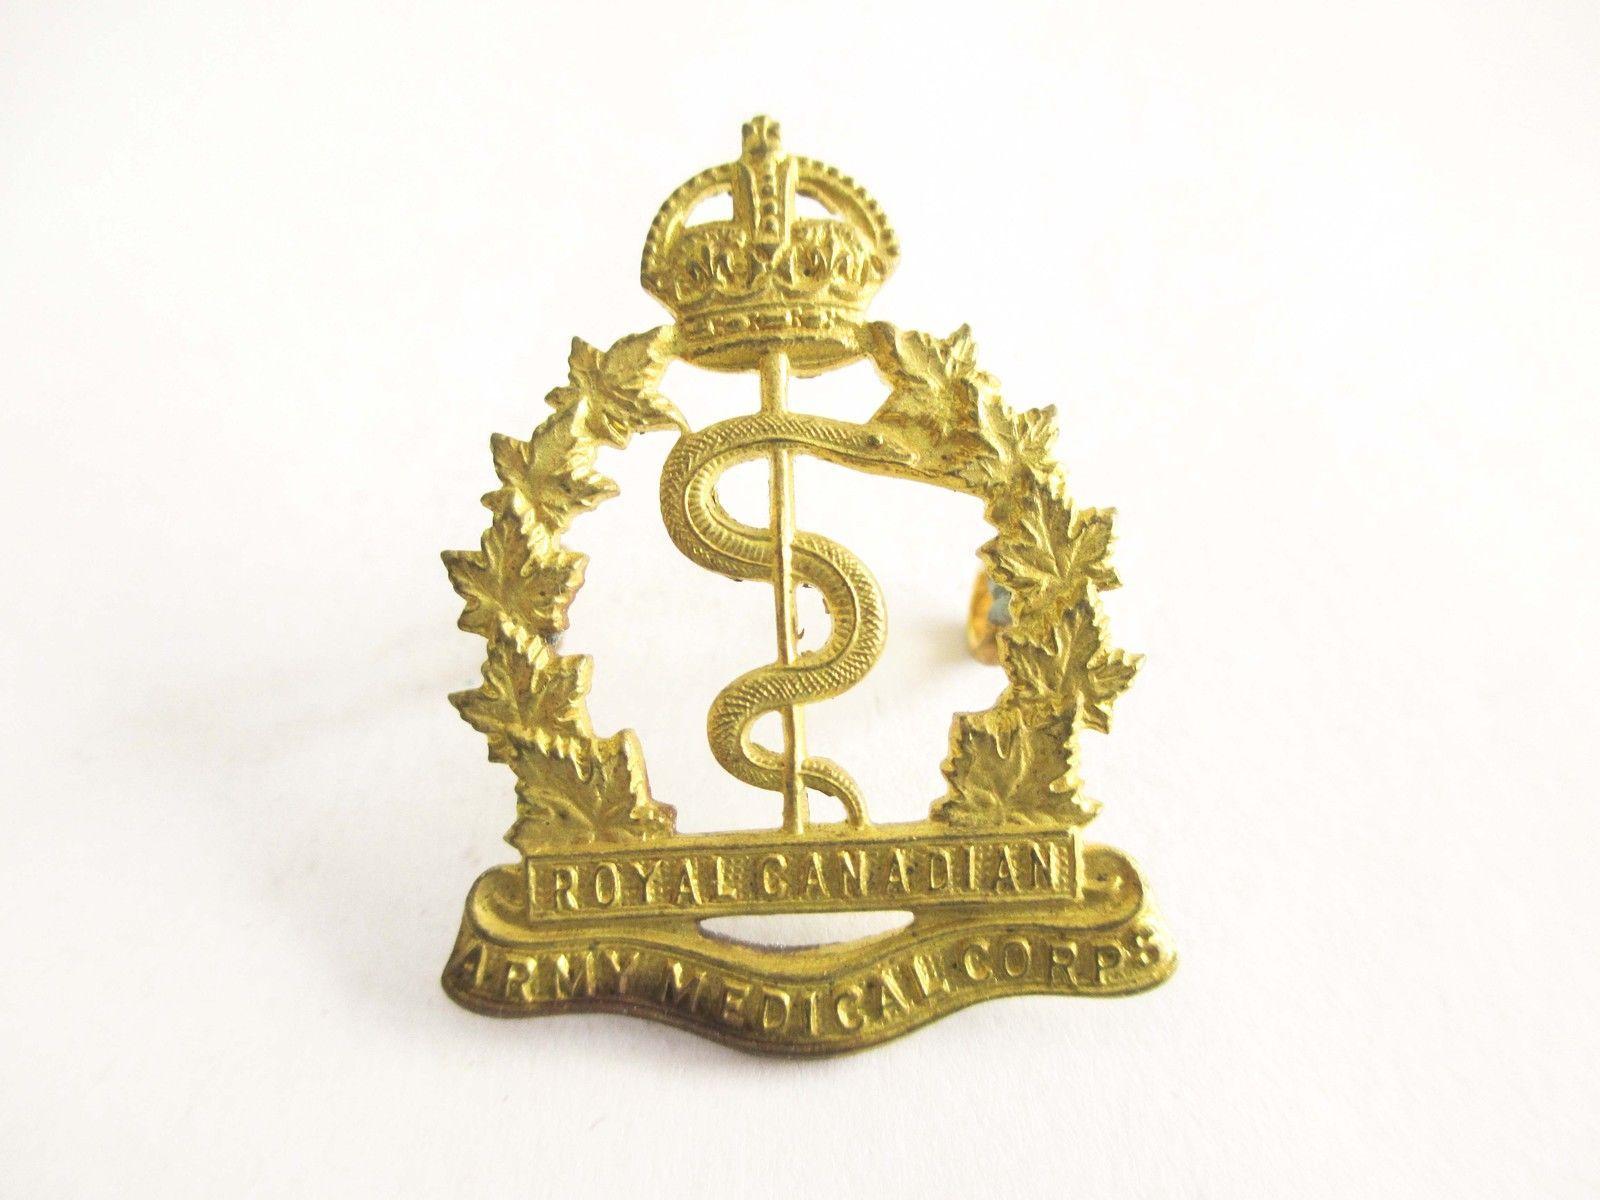 Royal Canadian Army Medical Corps Collar Badge Insignia Canada